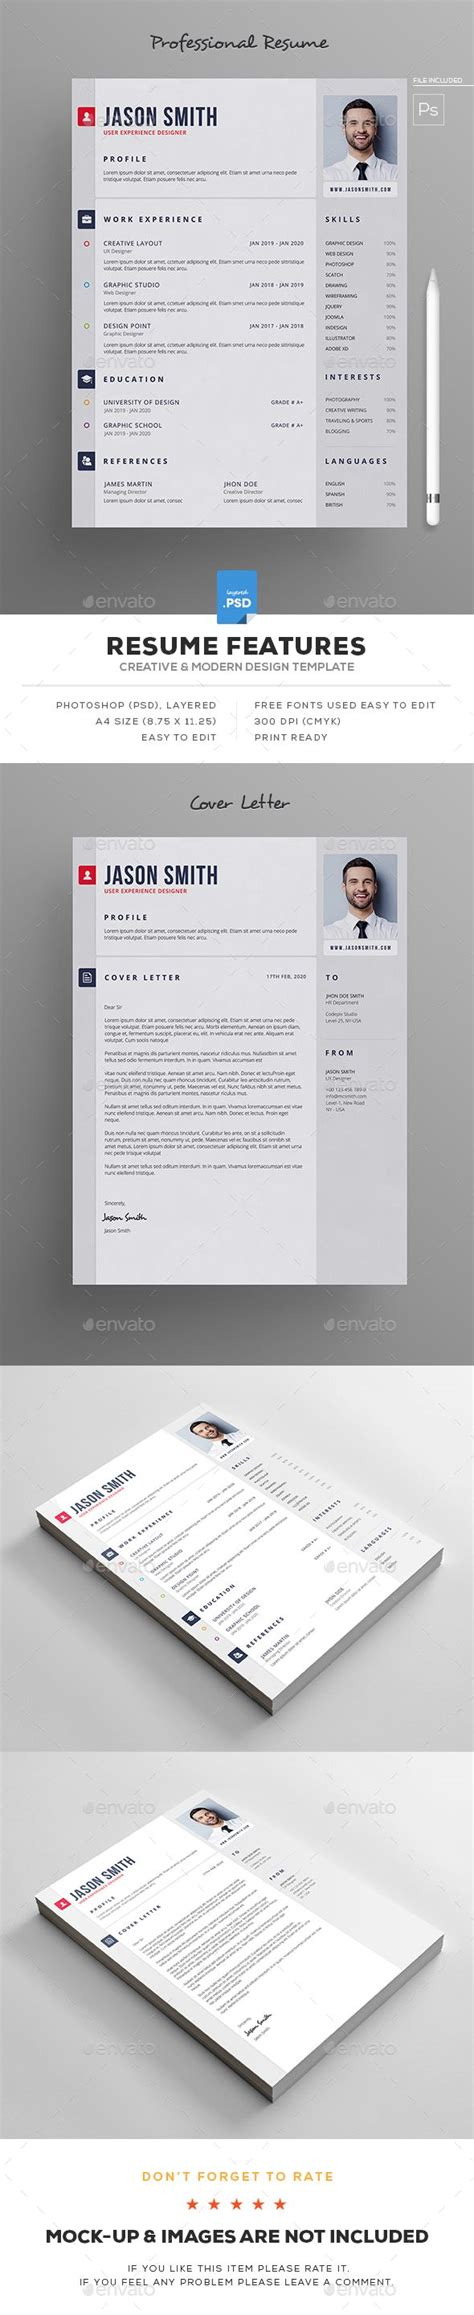 creative web design resumes ideas